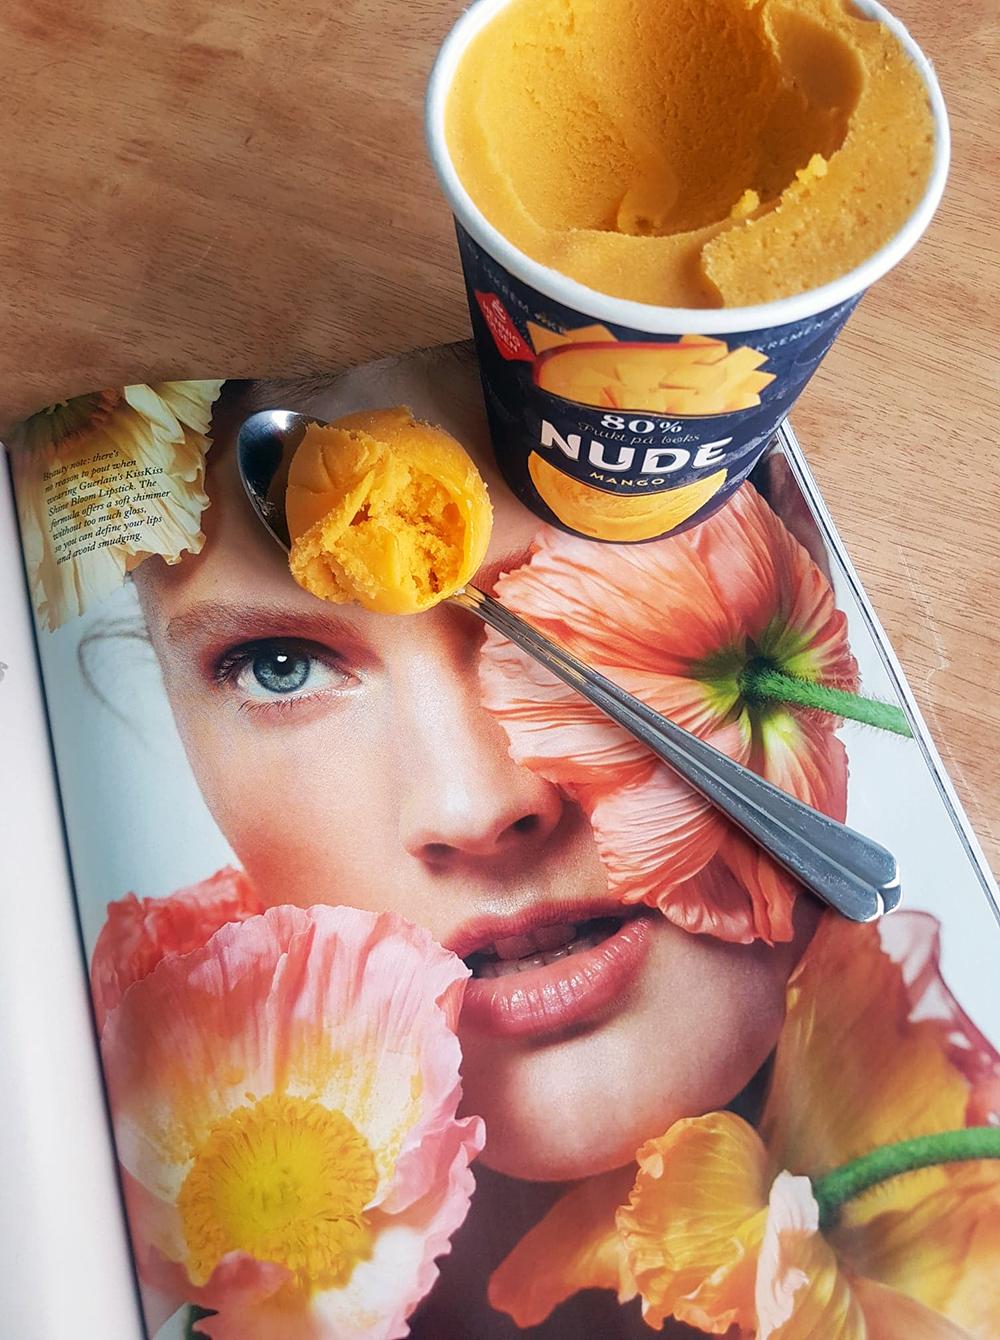 Nude Mango fra Hennig-Olsen